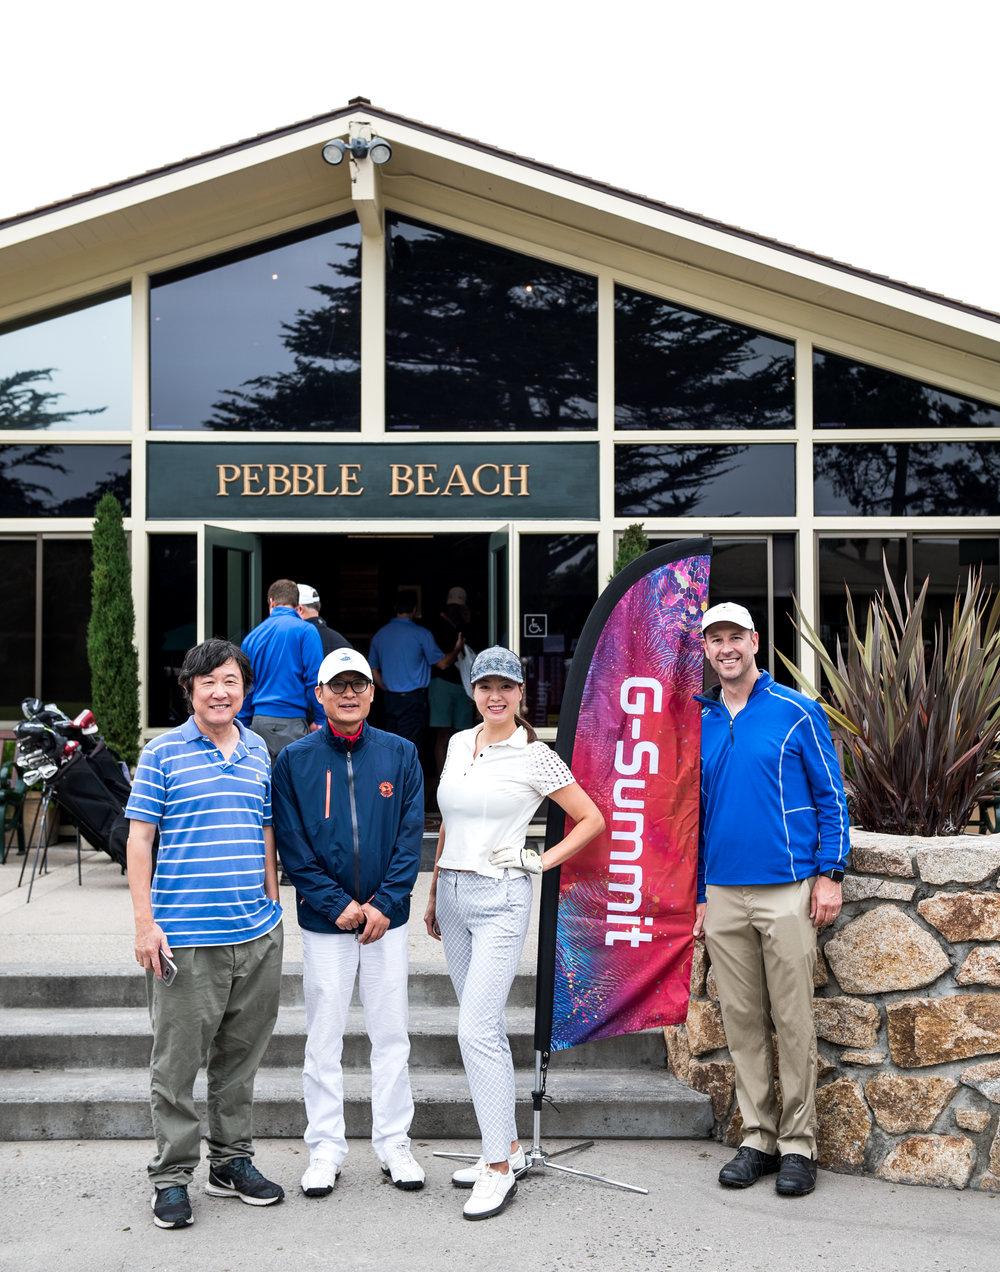 G-Summit - Pebble Beach Part 1_Sharplite Media_-21.jpg